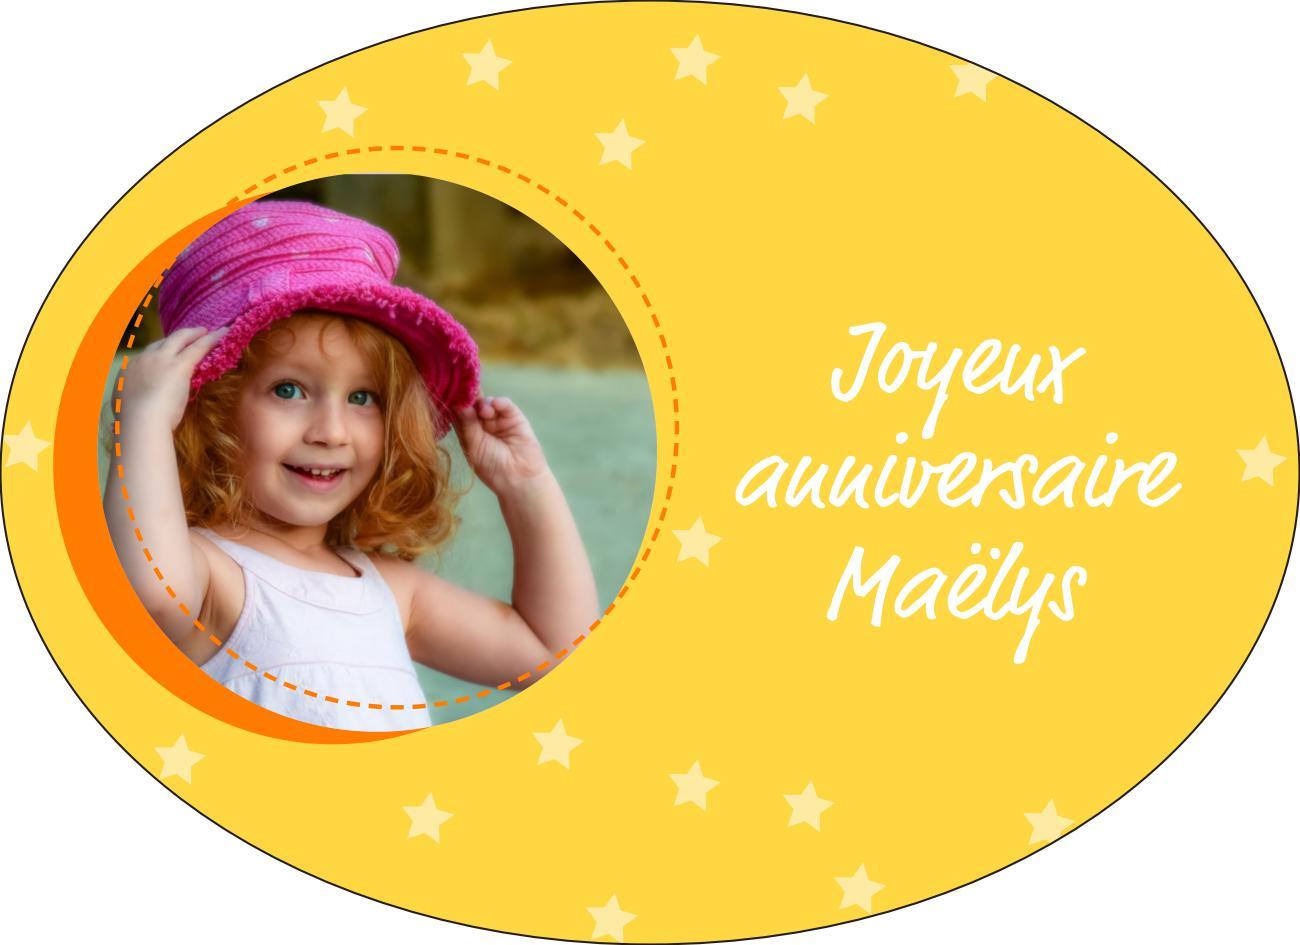 birthday-children-maelys_has-image